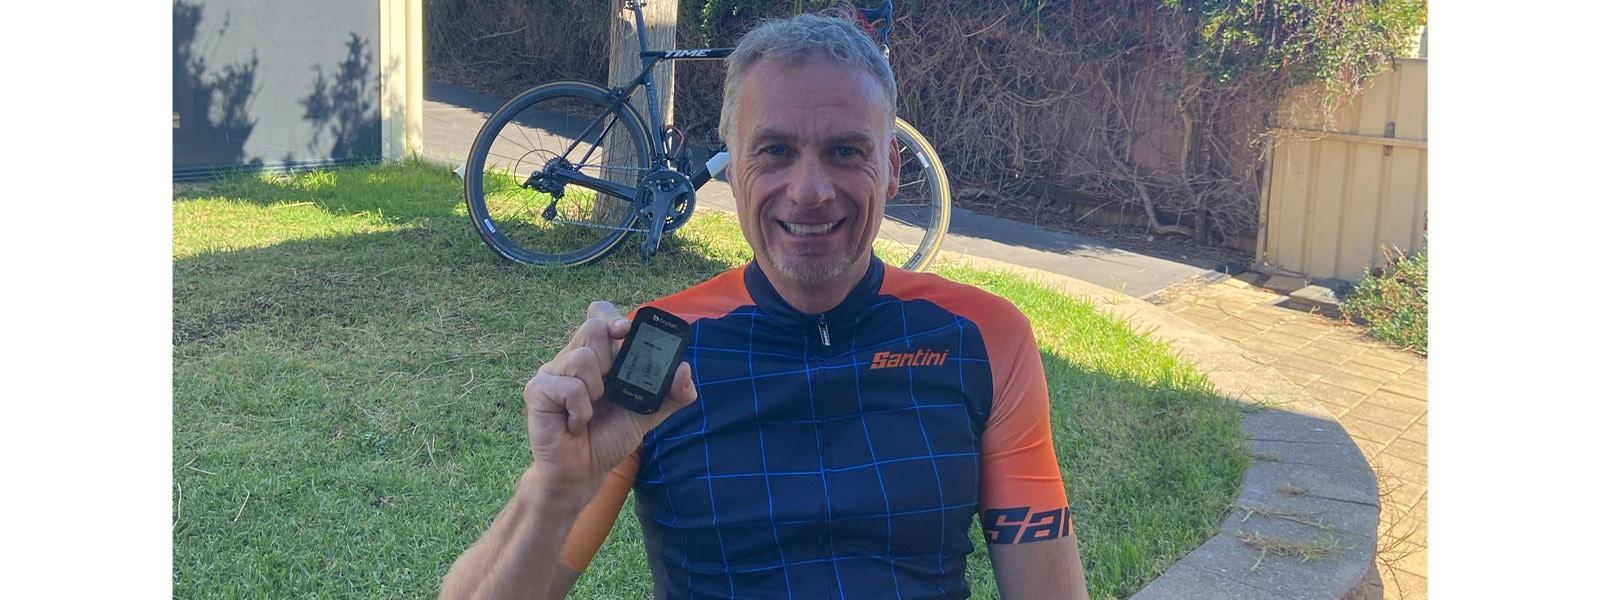 Bryton - Riding with the Bryton 420 GPS Cycling Computer